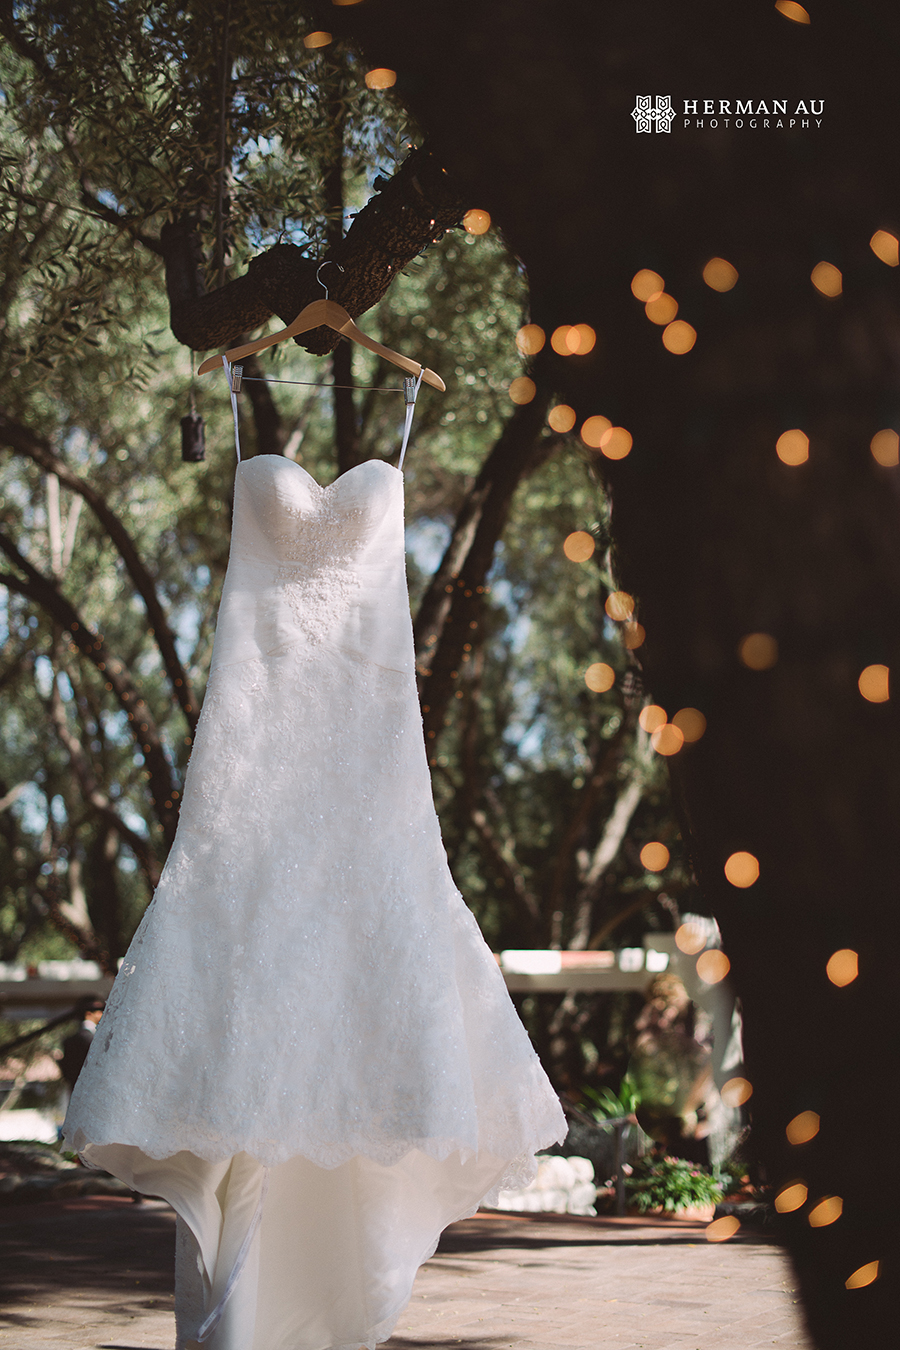 03.Padua Hills Theatre wedding dress